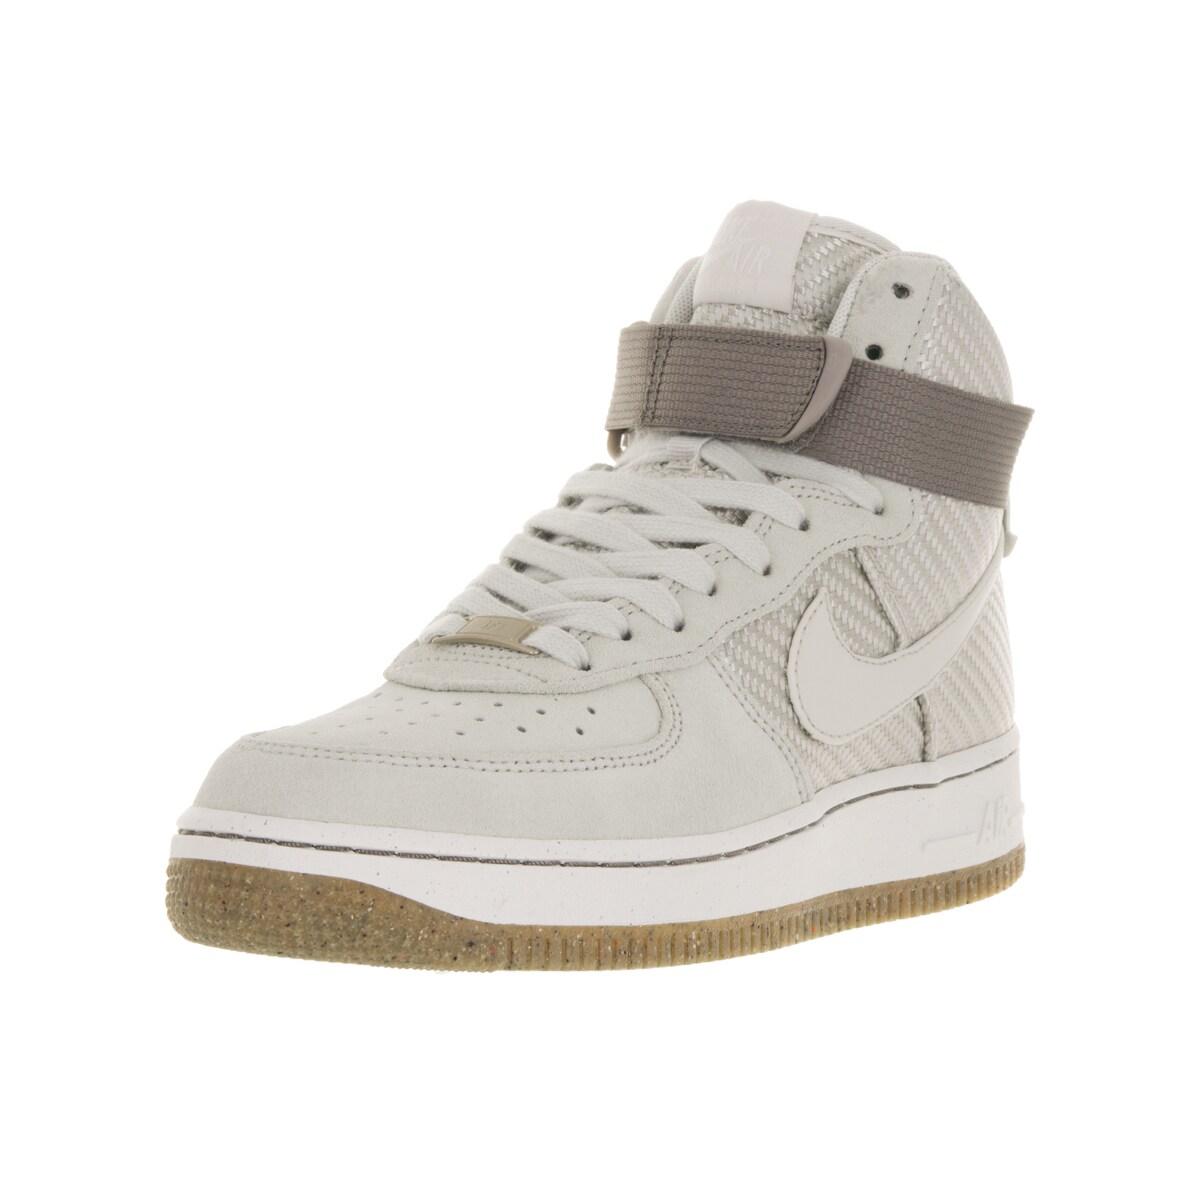 1e805d0fef12 Shop Nike Women s Air Force 1 Hi Prm Beige Basketball Shoe - Free Shipping  Today - Overstock.com - 13343915